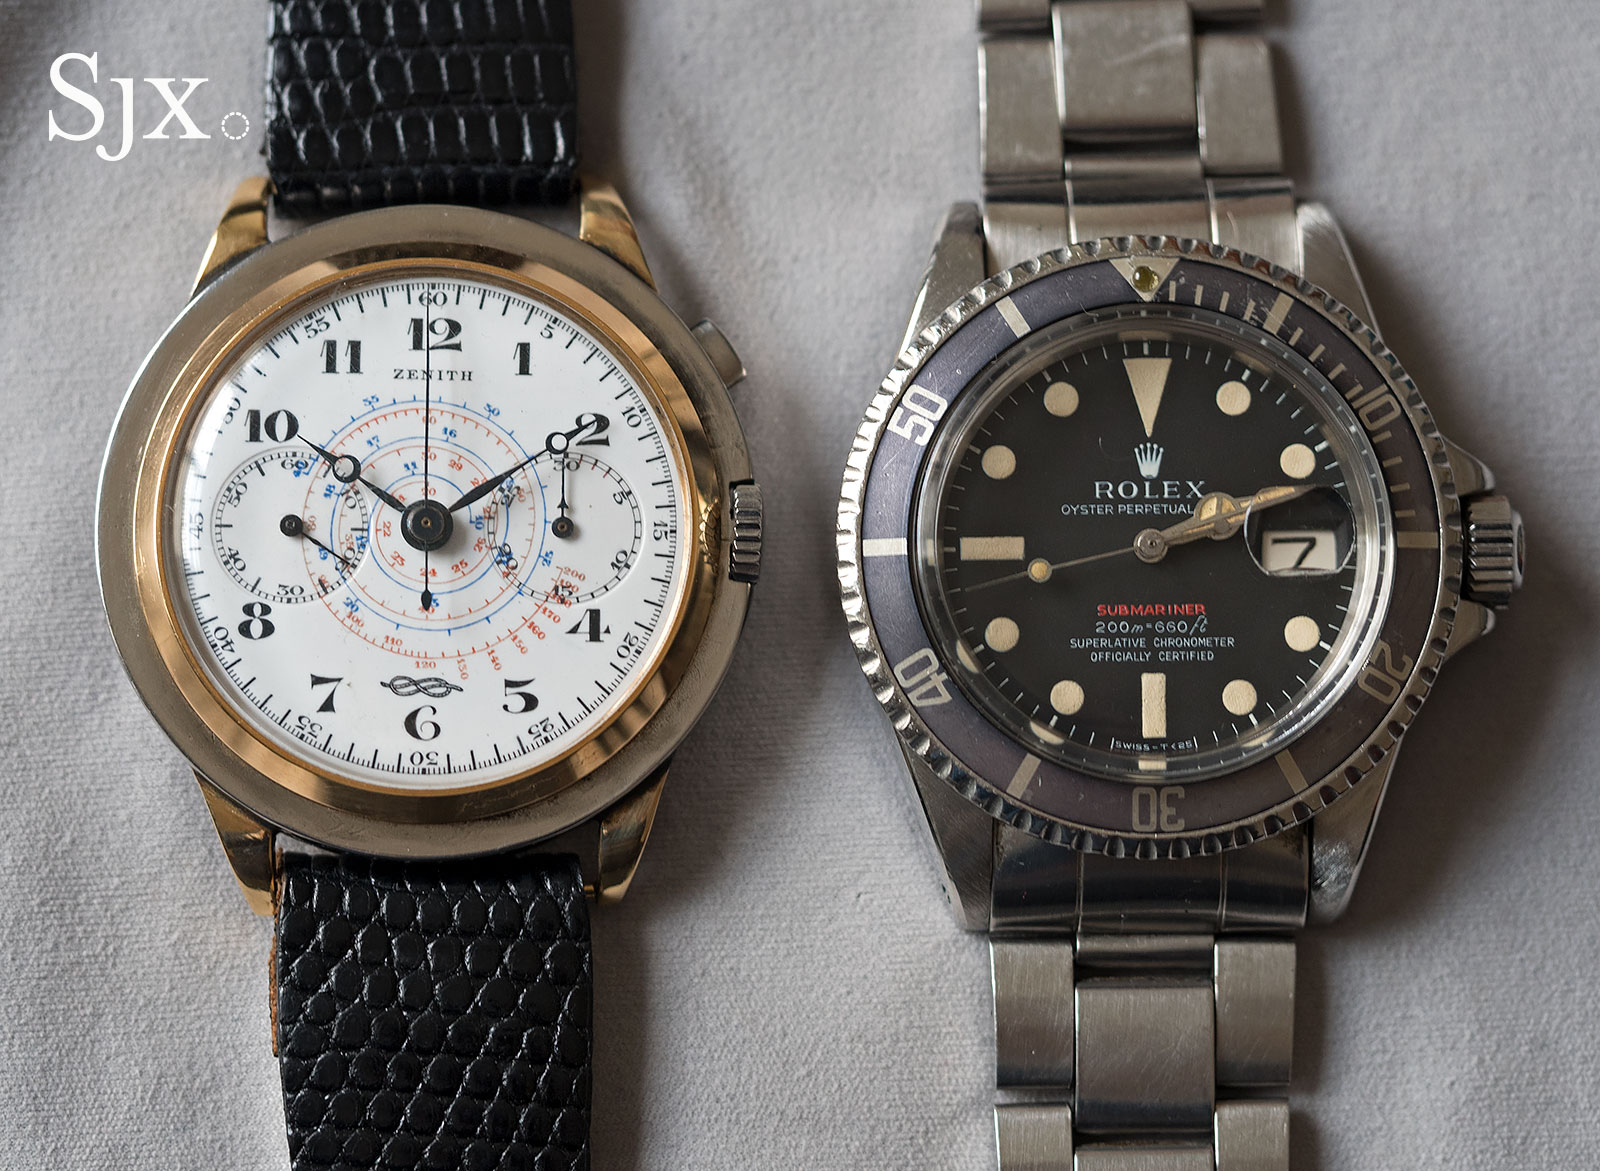 Zenith 4528 Marina Militare chronograph 1